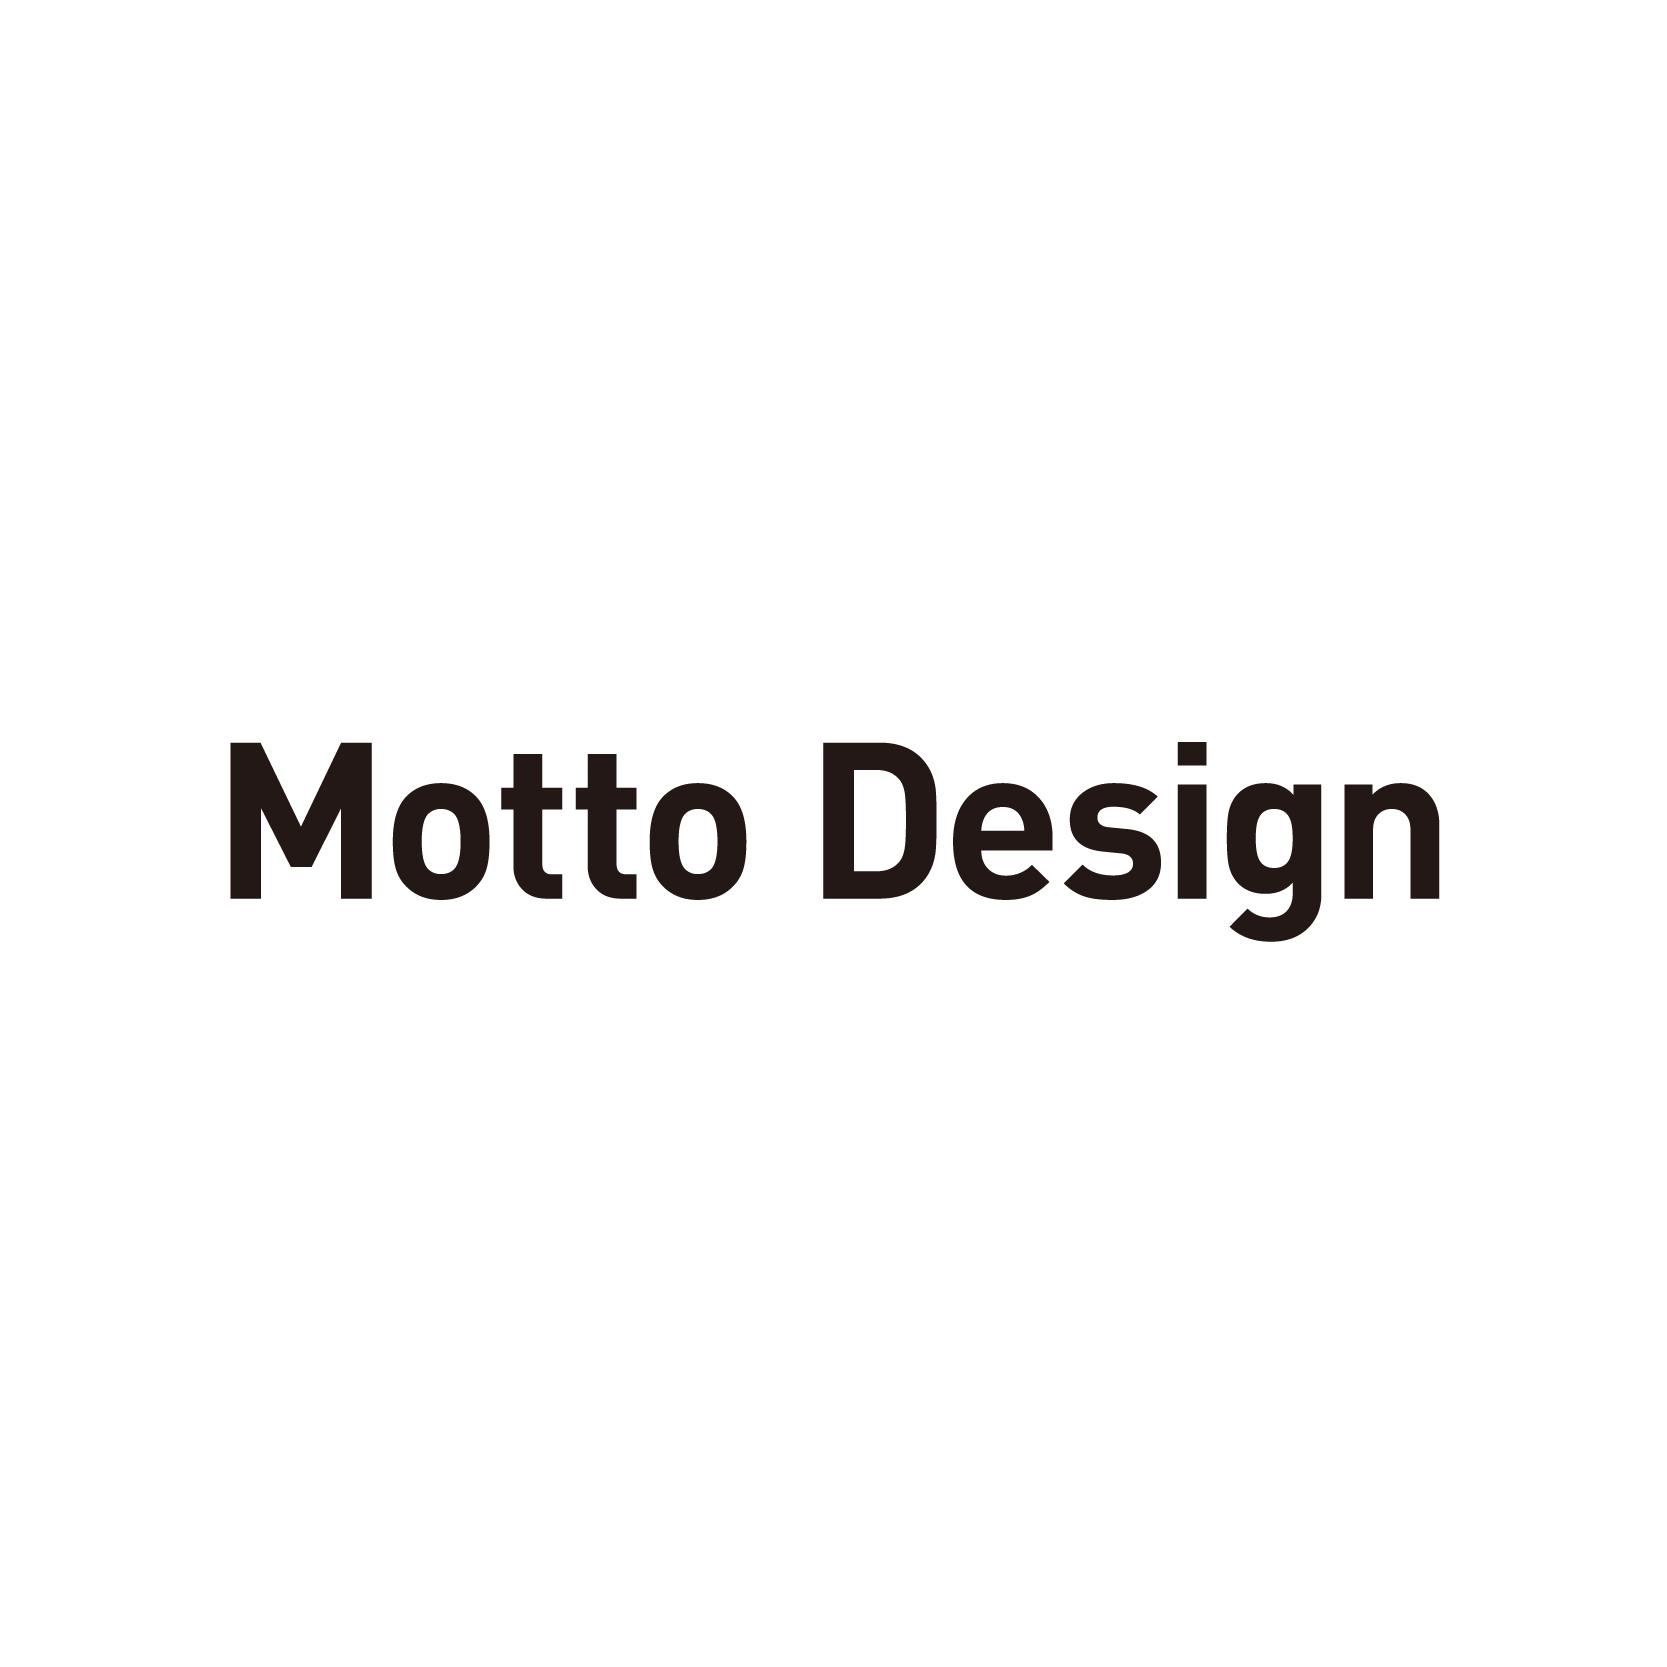 Motto Design